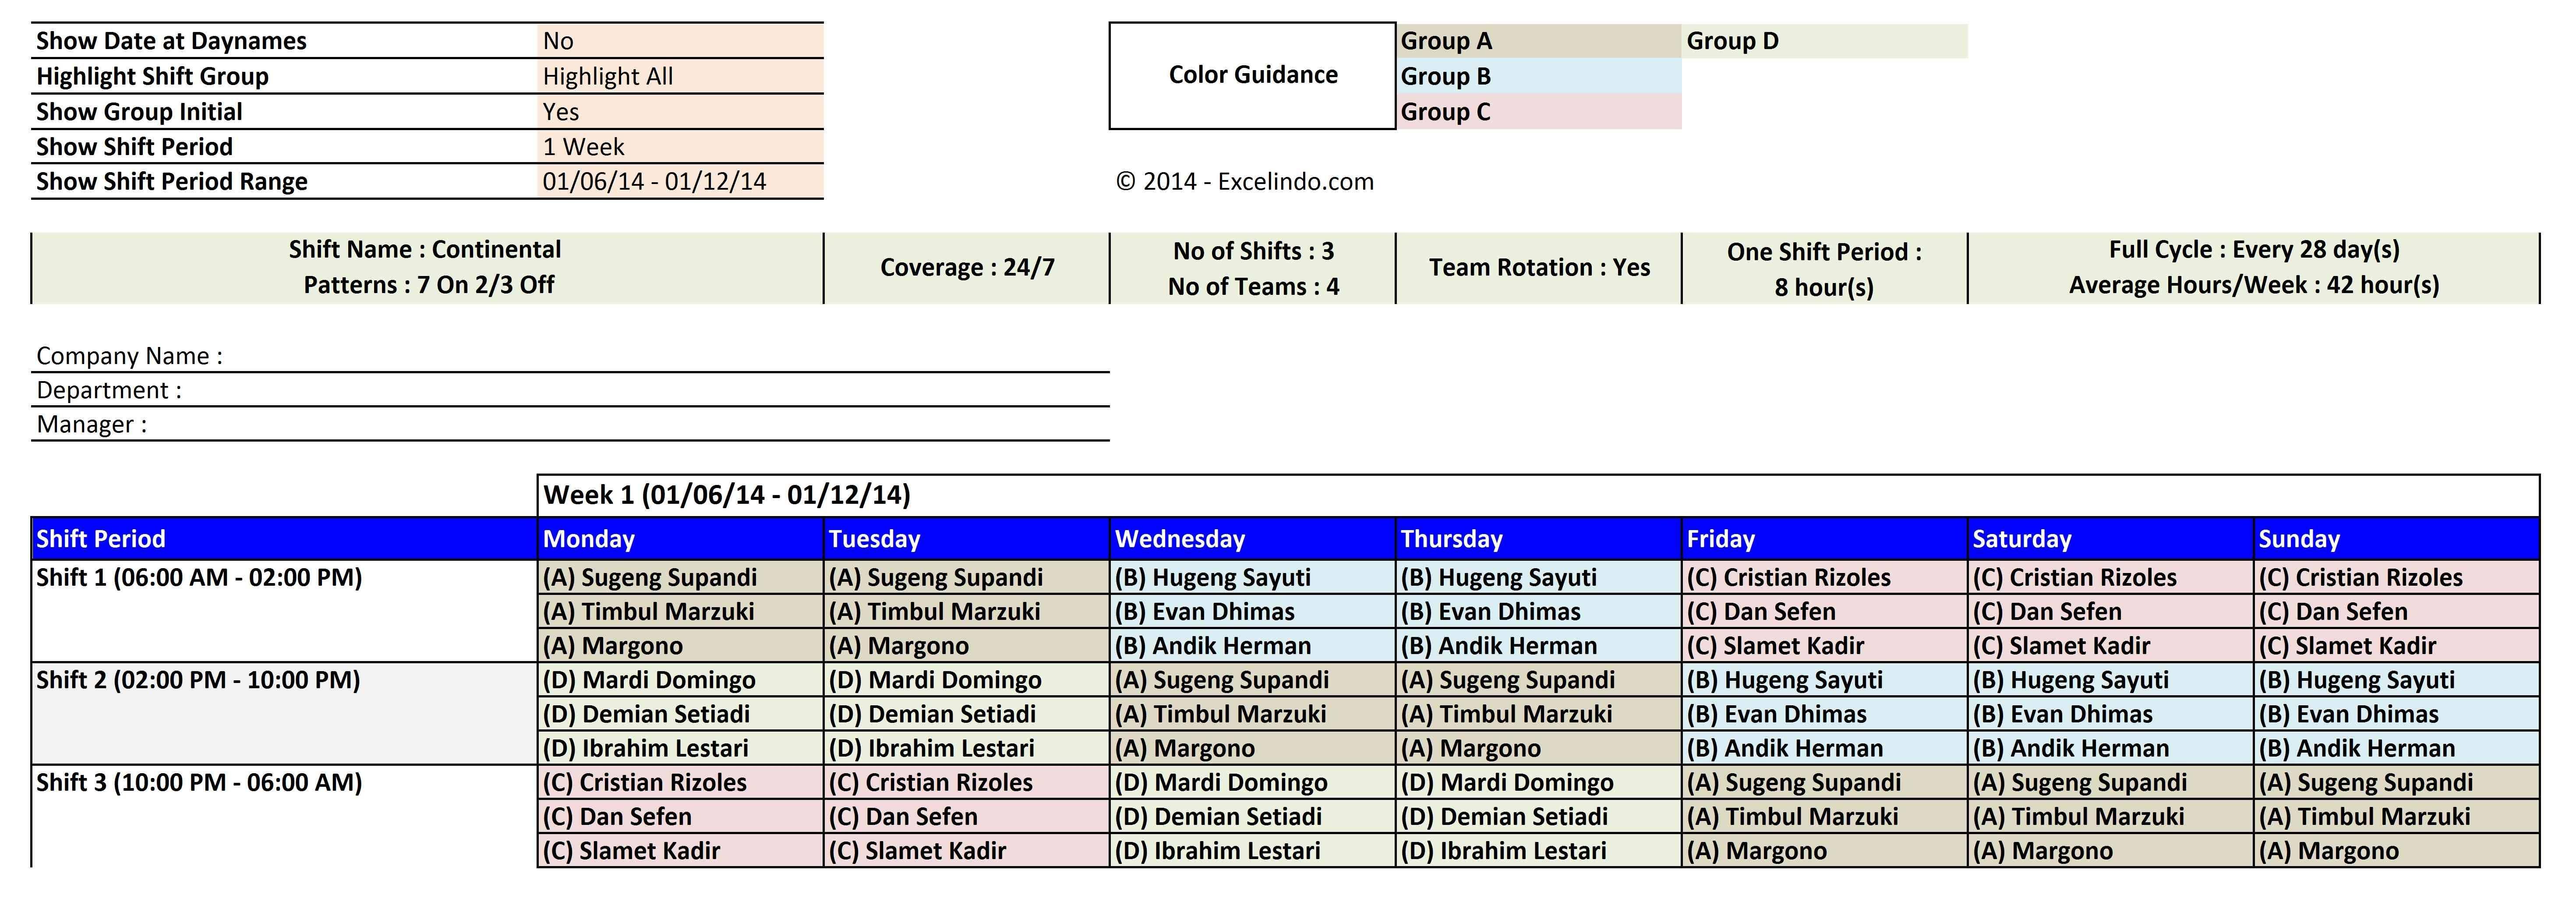 Employee Shift Scheduling Spreadsheet | LAOBING KAISUO